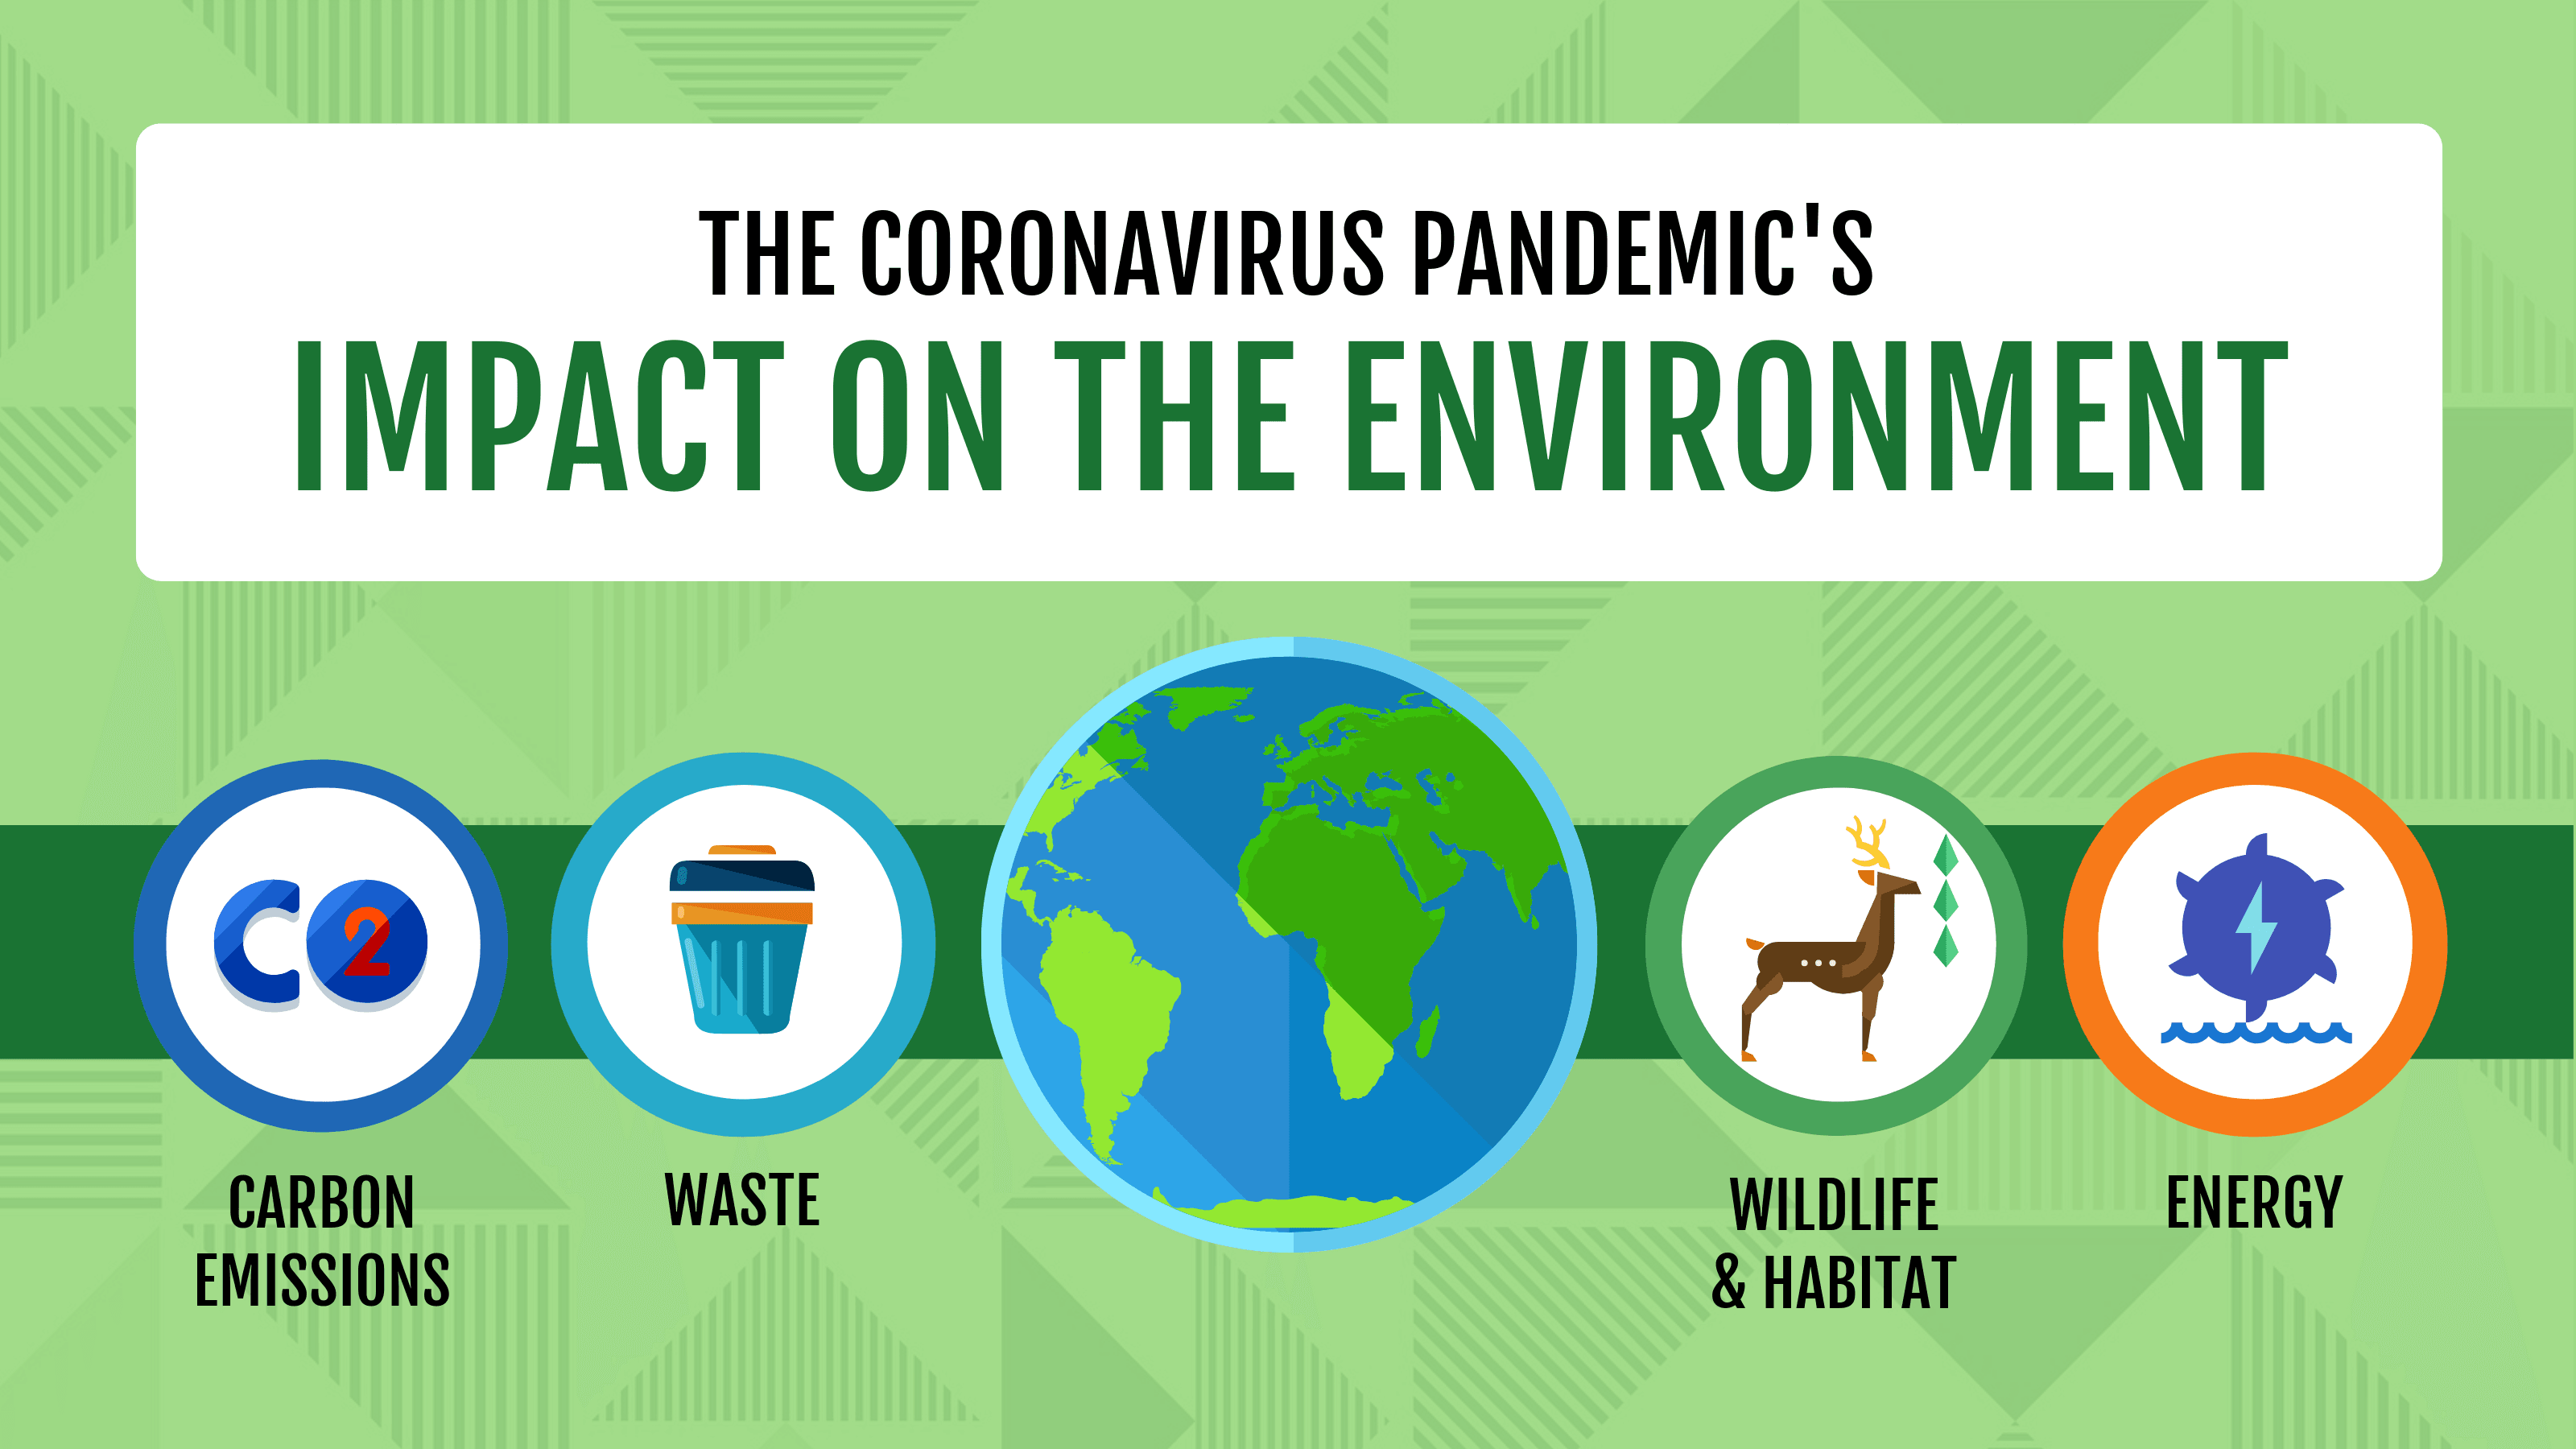 Coronavirus_Pandemic_Impact_on_Environment_Blog_Header-Compressed